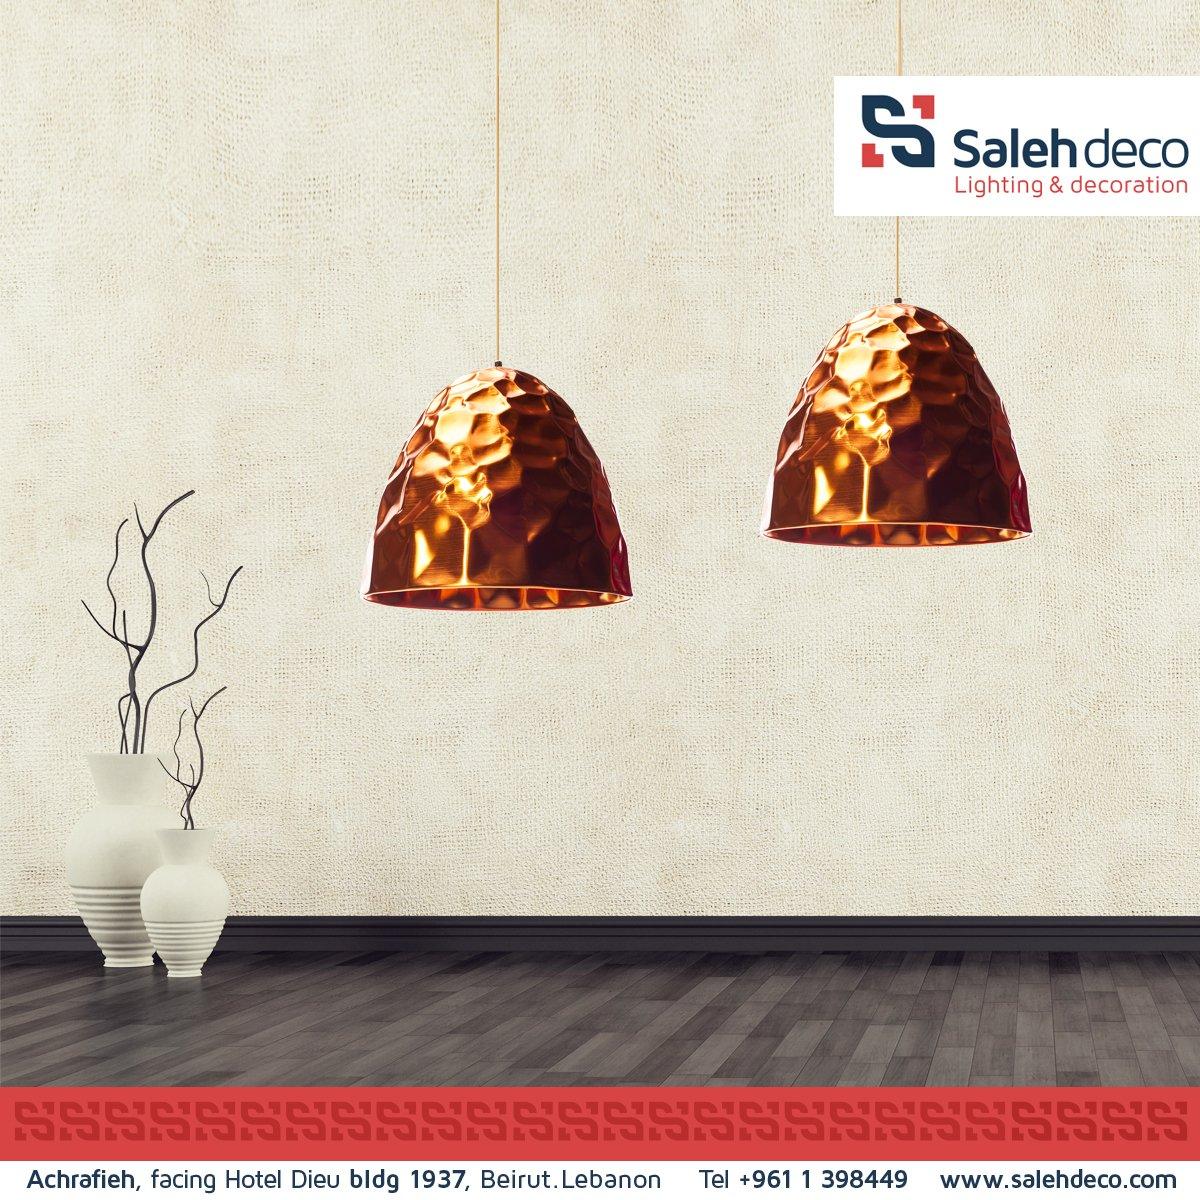 Decorate your #modern #interior with this beautiful #pendant #light #decor #homedecor #interiordesign #salehdeco https://t.co/HP7Kj5e0BL